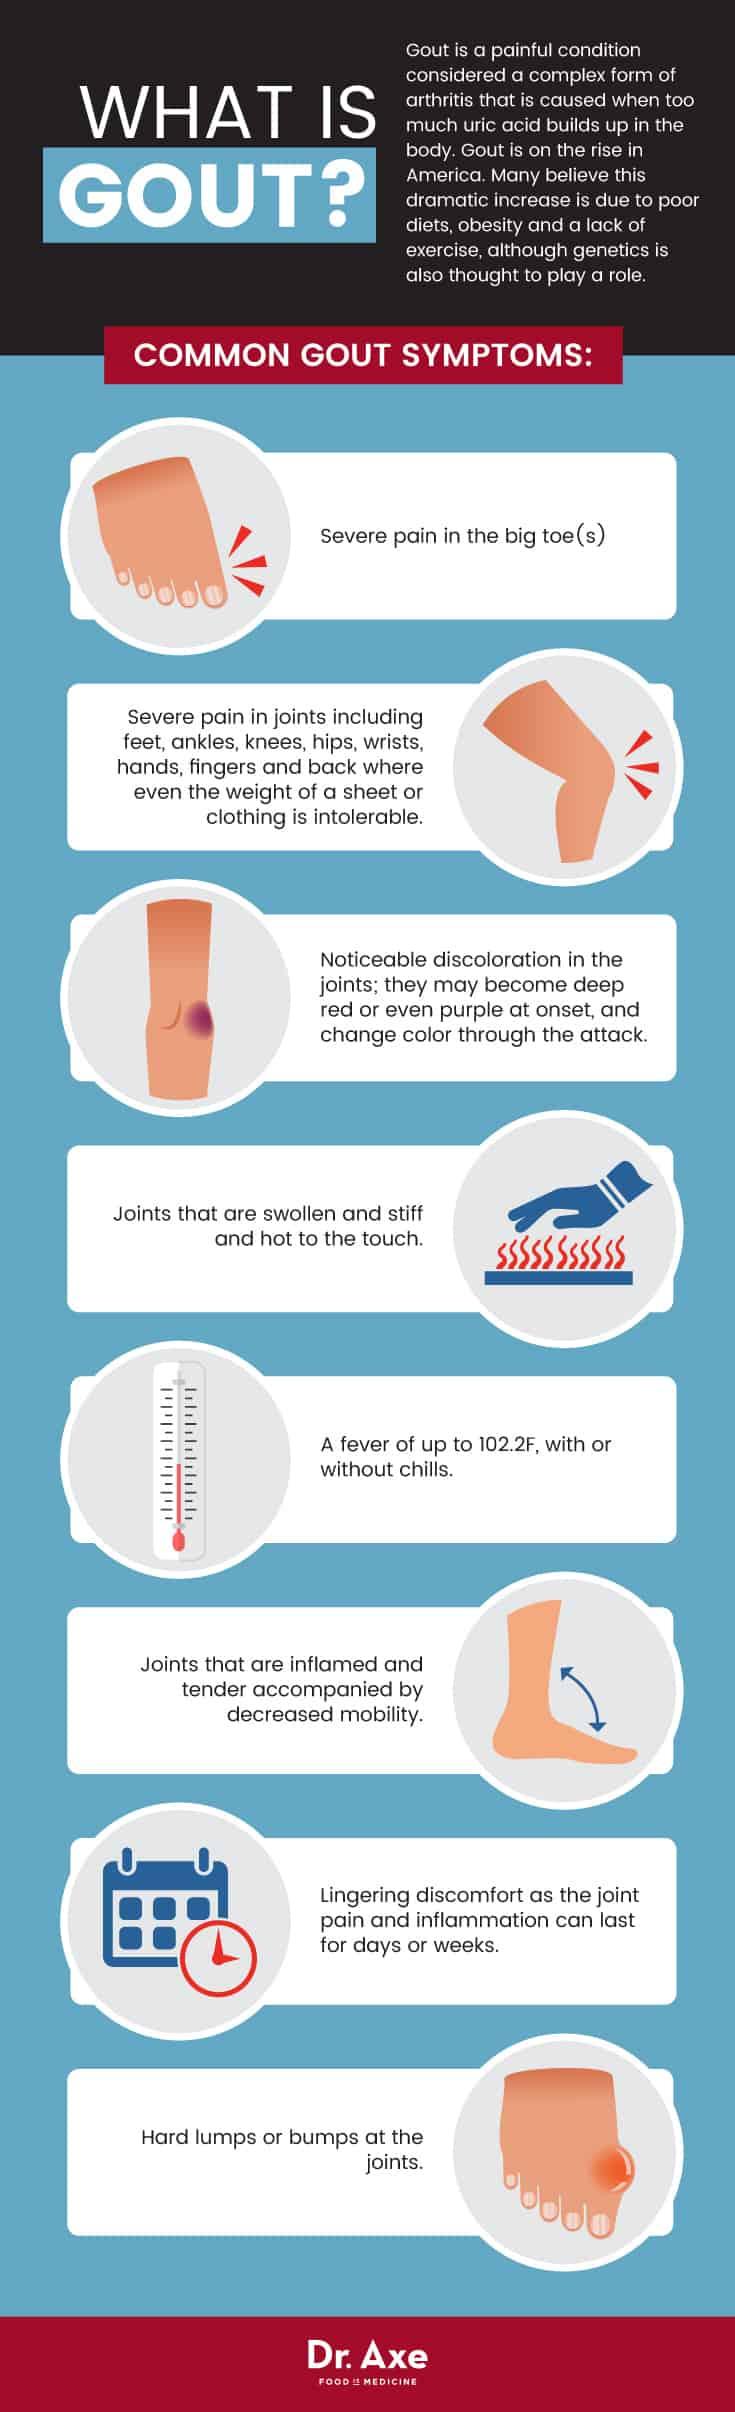 What is gout: gout symptoms - Dr. Axe